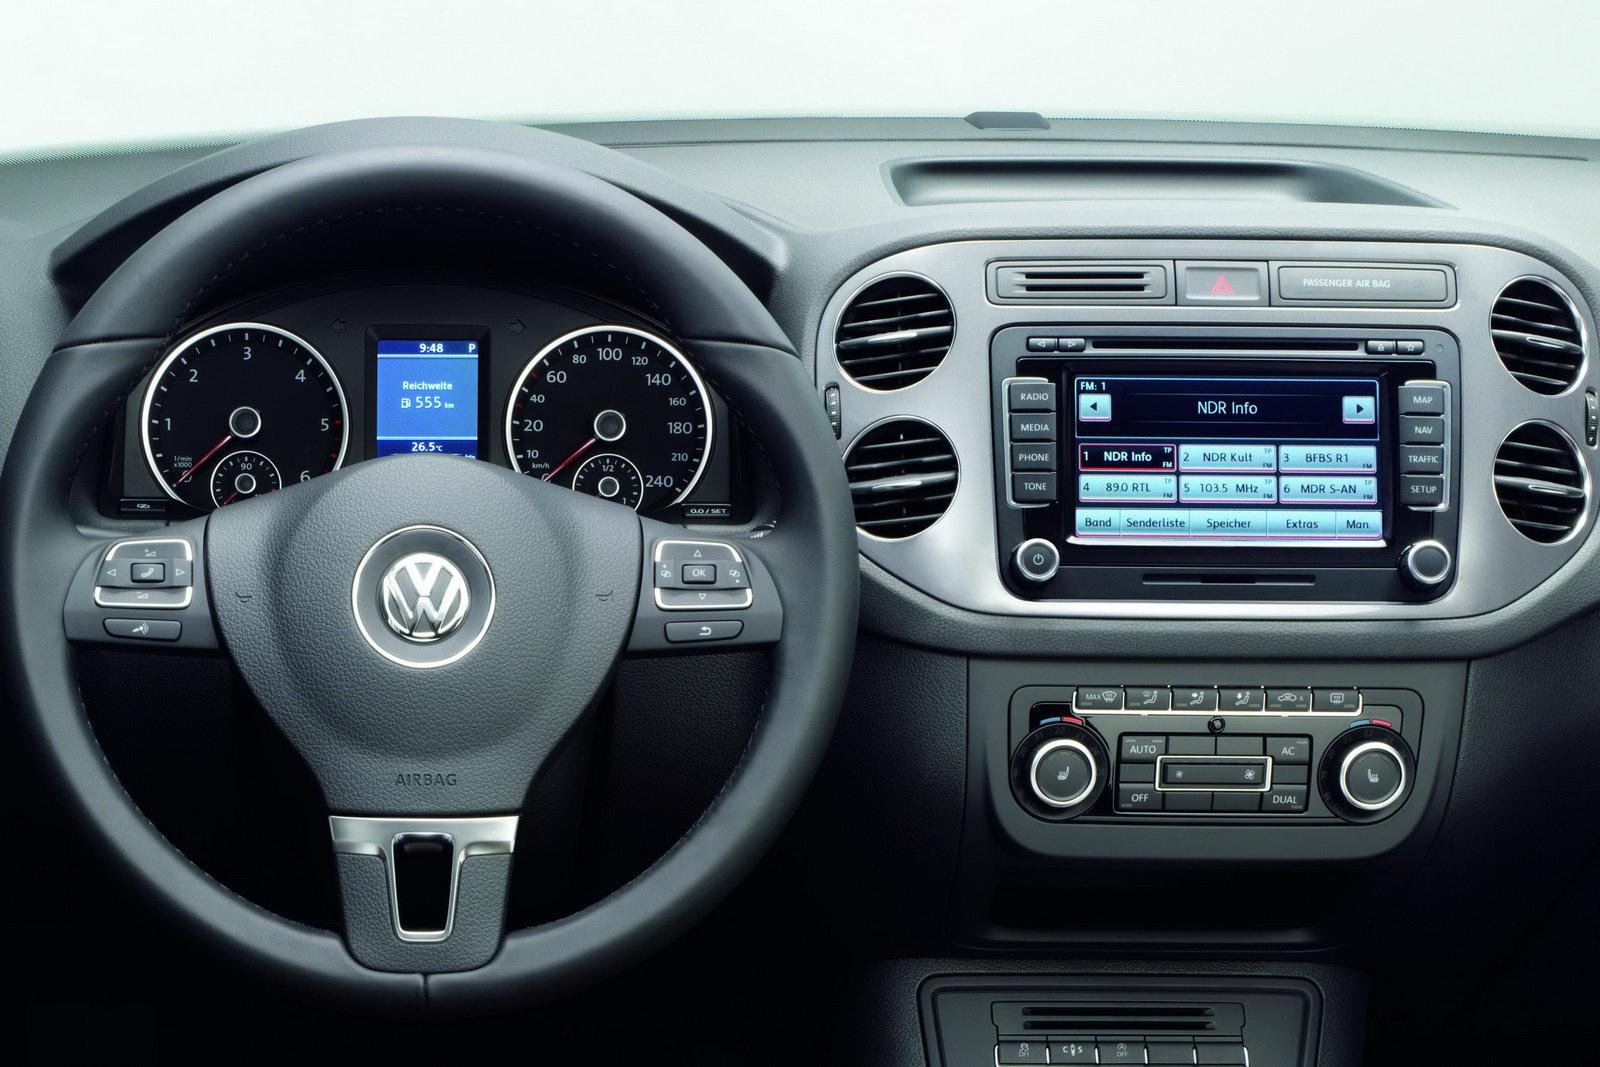 VW Tiguan Facelift New Photos and Details - autoevolution